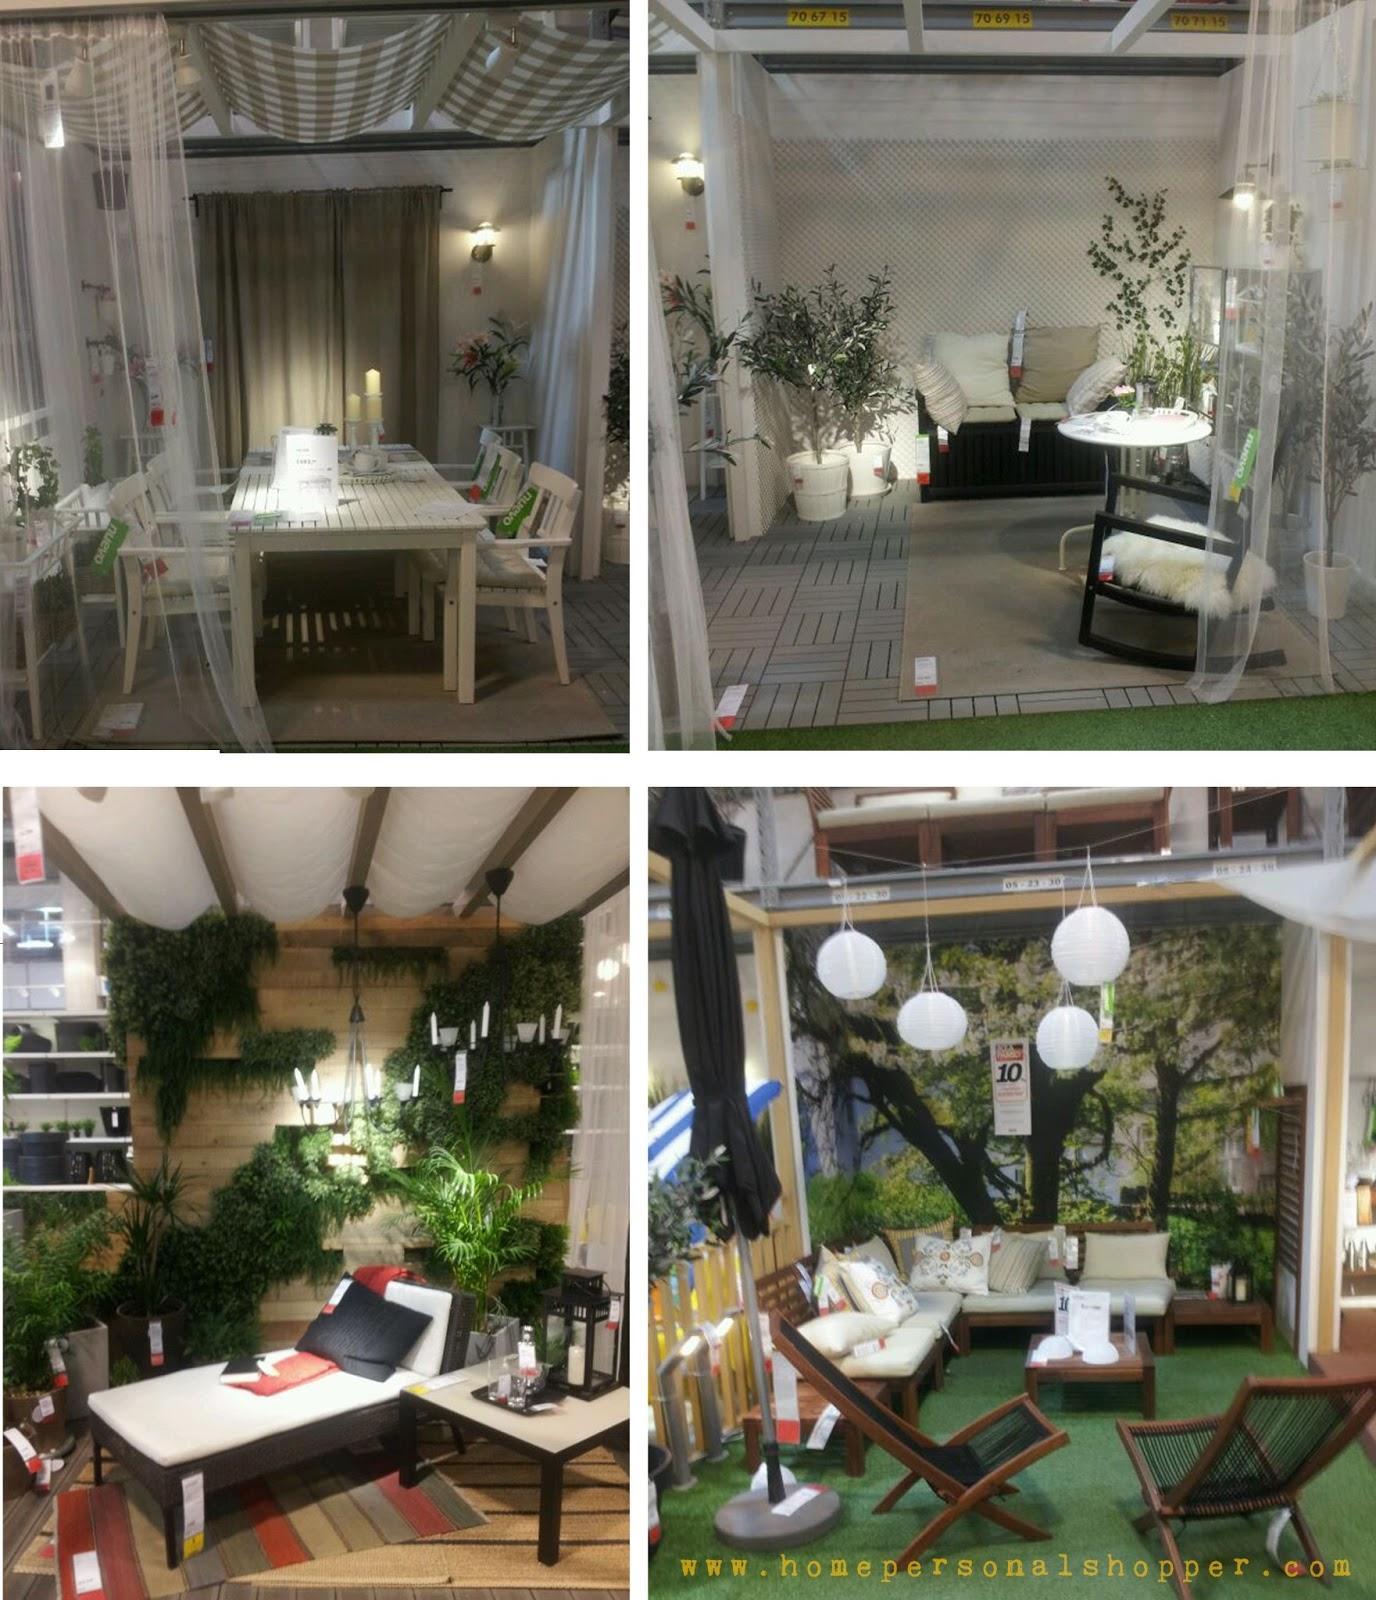 Llega la primavera a ikea paperblog - Ikea muebles jardin exteriores lyon ...